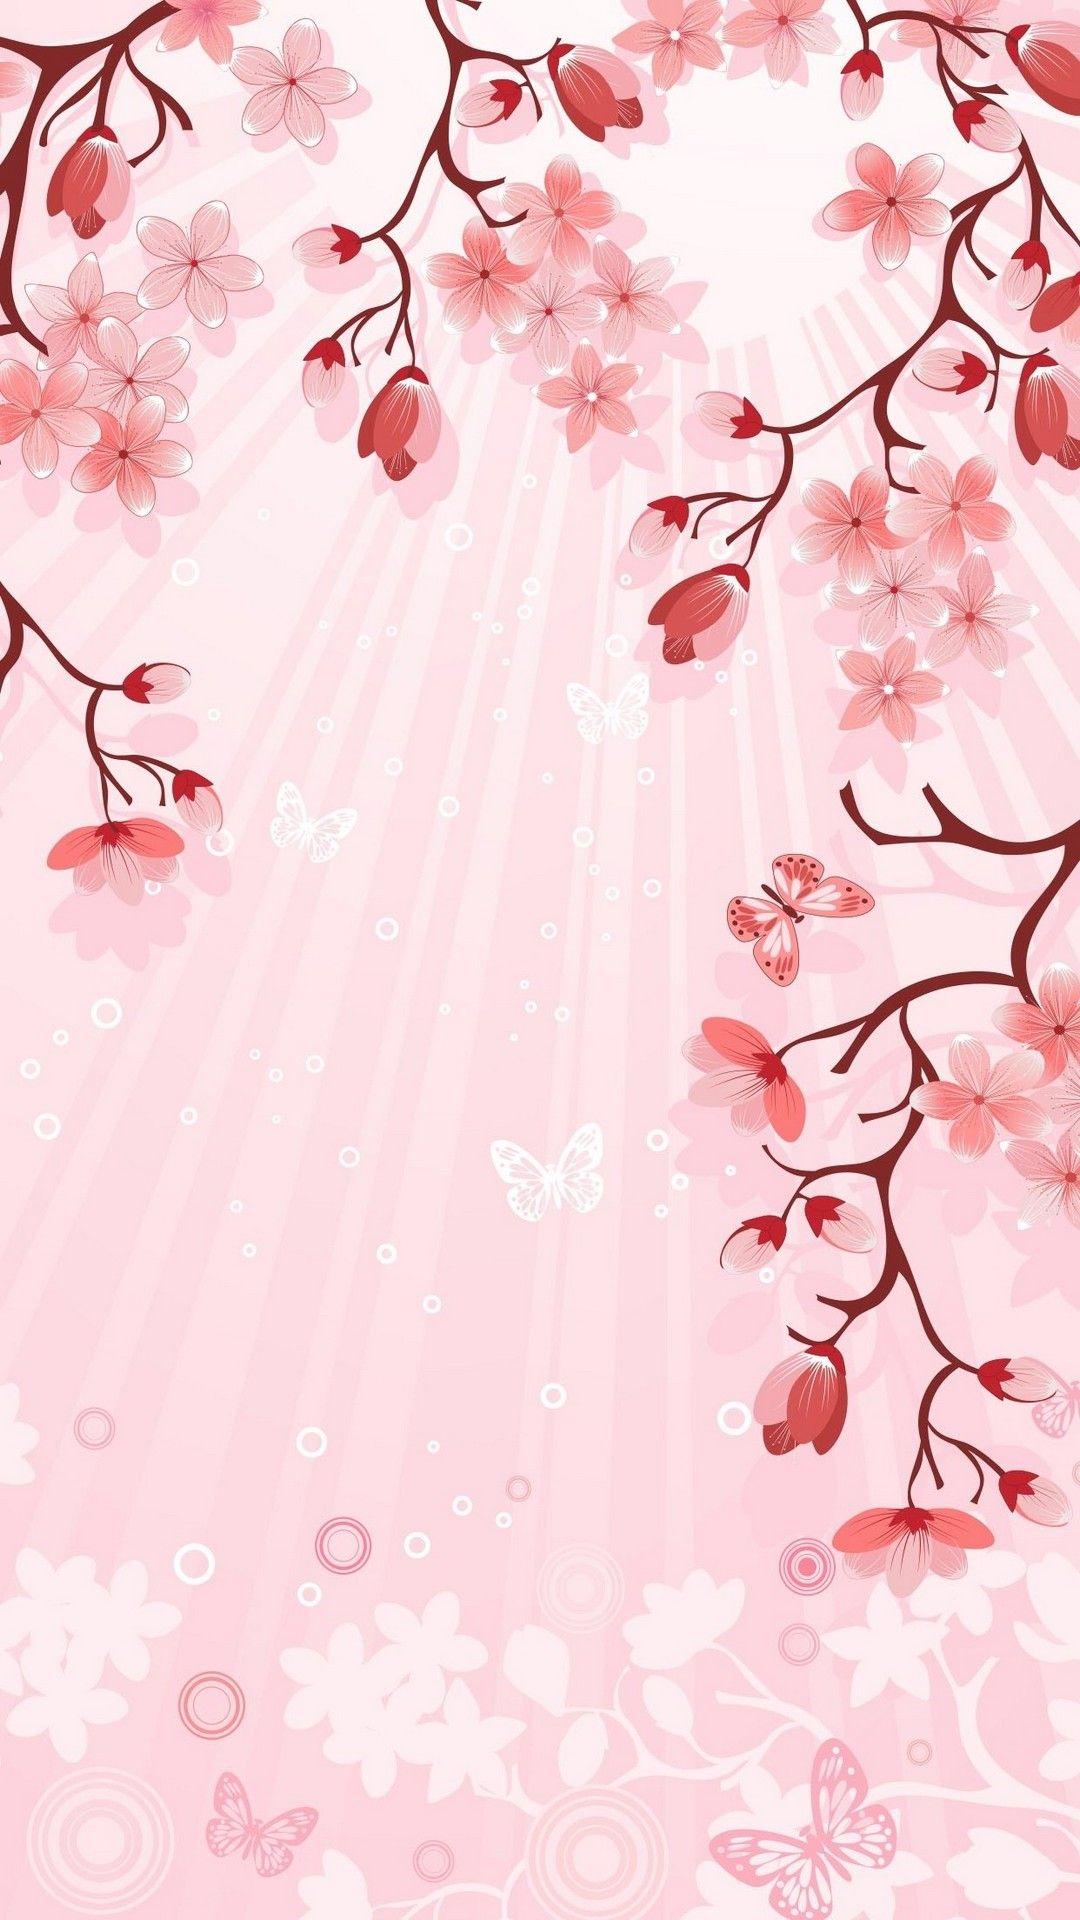 Pink Flower Wallpaper Animated Best Hd Wallpapers Pink Flowers Wallpaper Flowery Wallpaper Flower Wallpaper